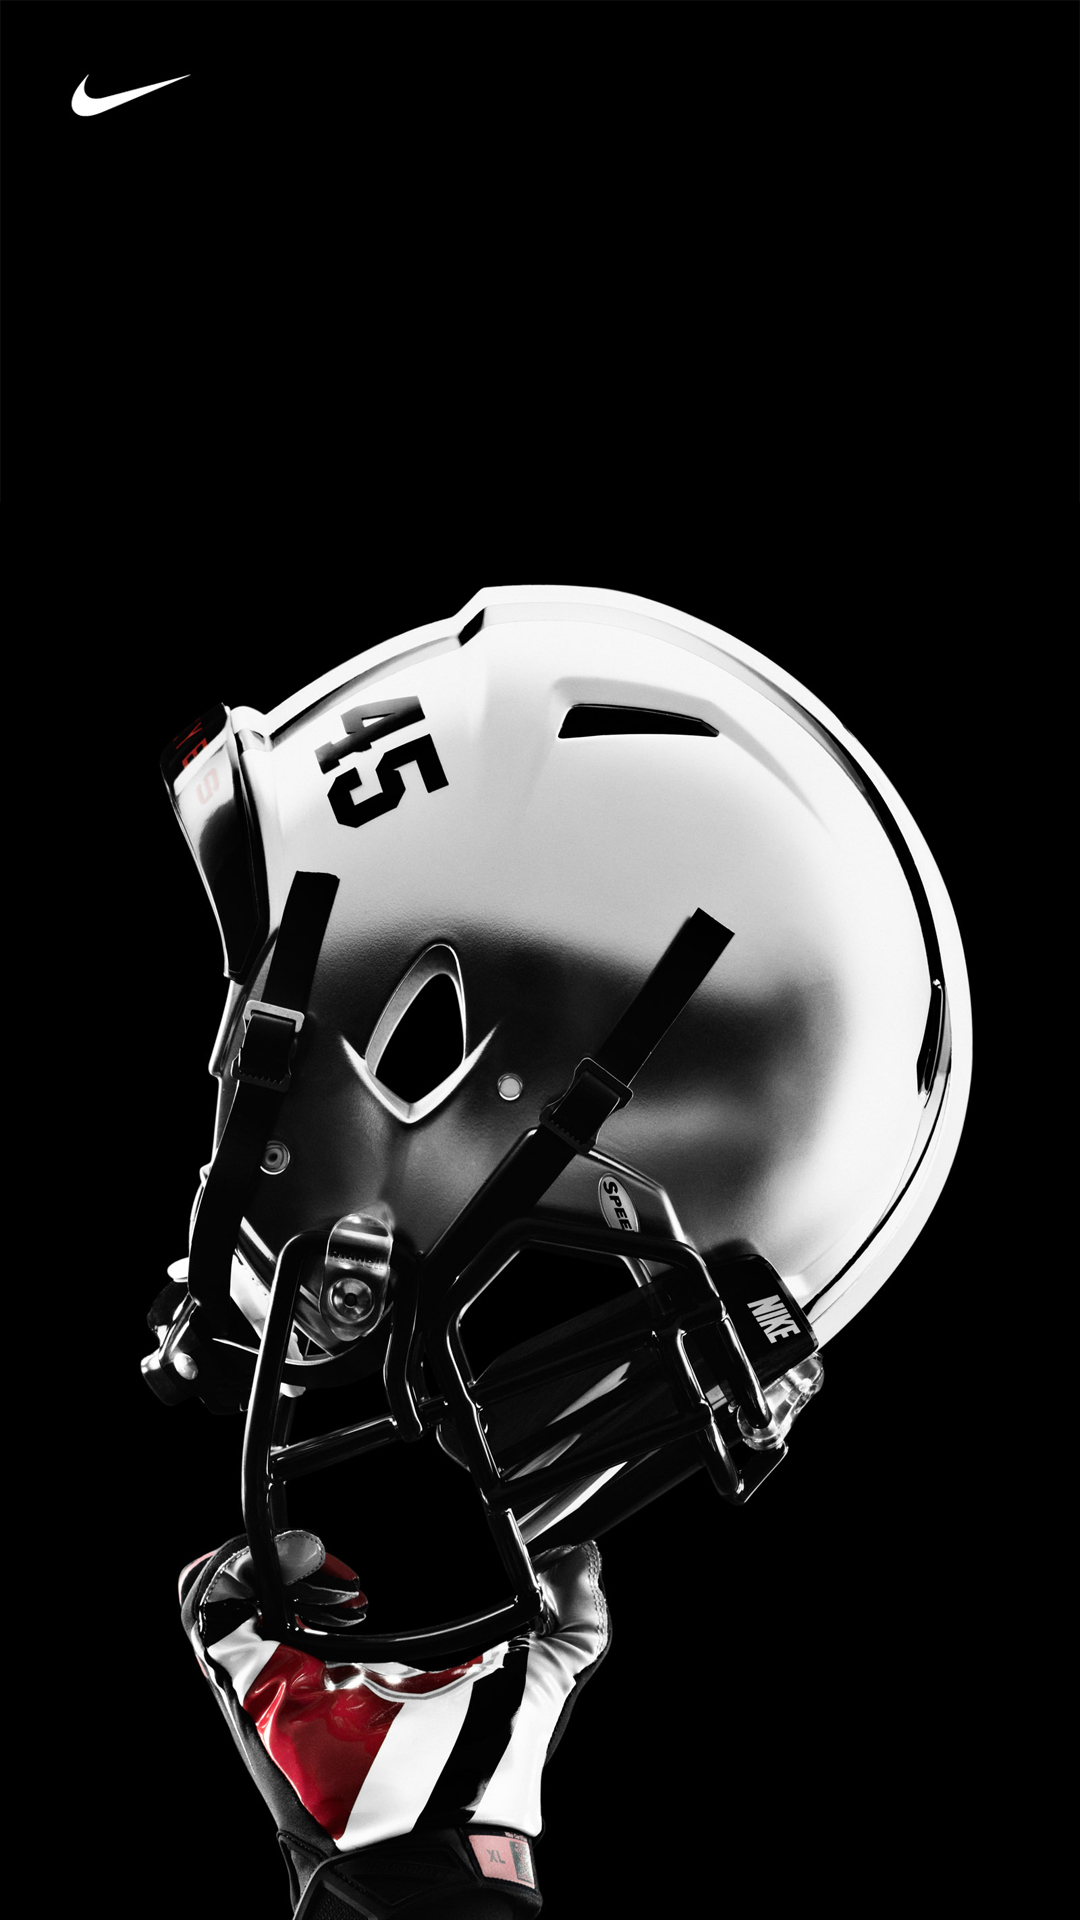 Nike American Football Wallpaper Ohio state nike pro combat 1080x1920